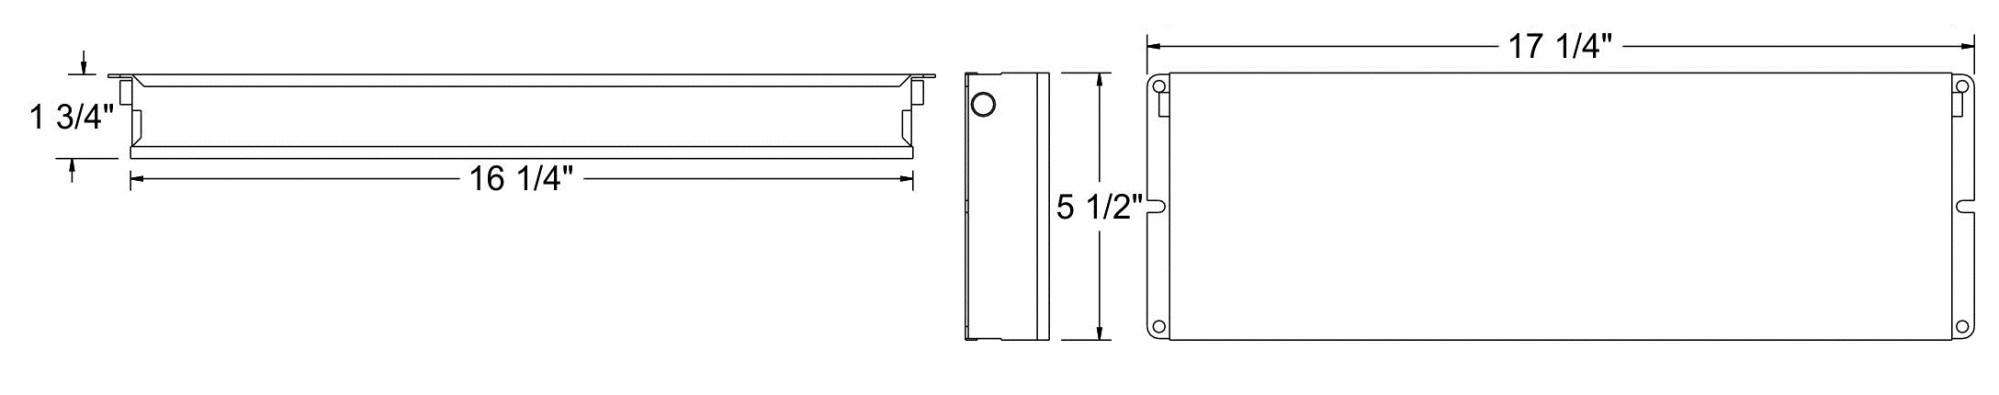 hight resolution of bal3000 emergency ballasts exit emergency lighting bal3000 em ballast wiring diagram